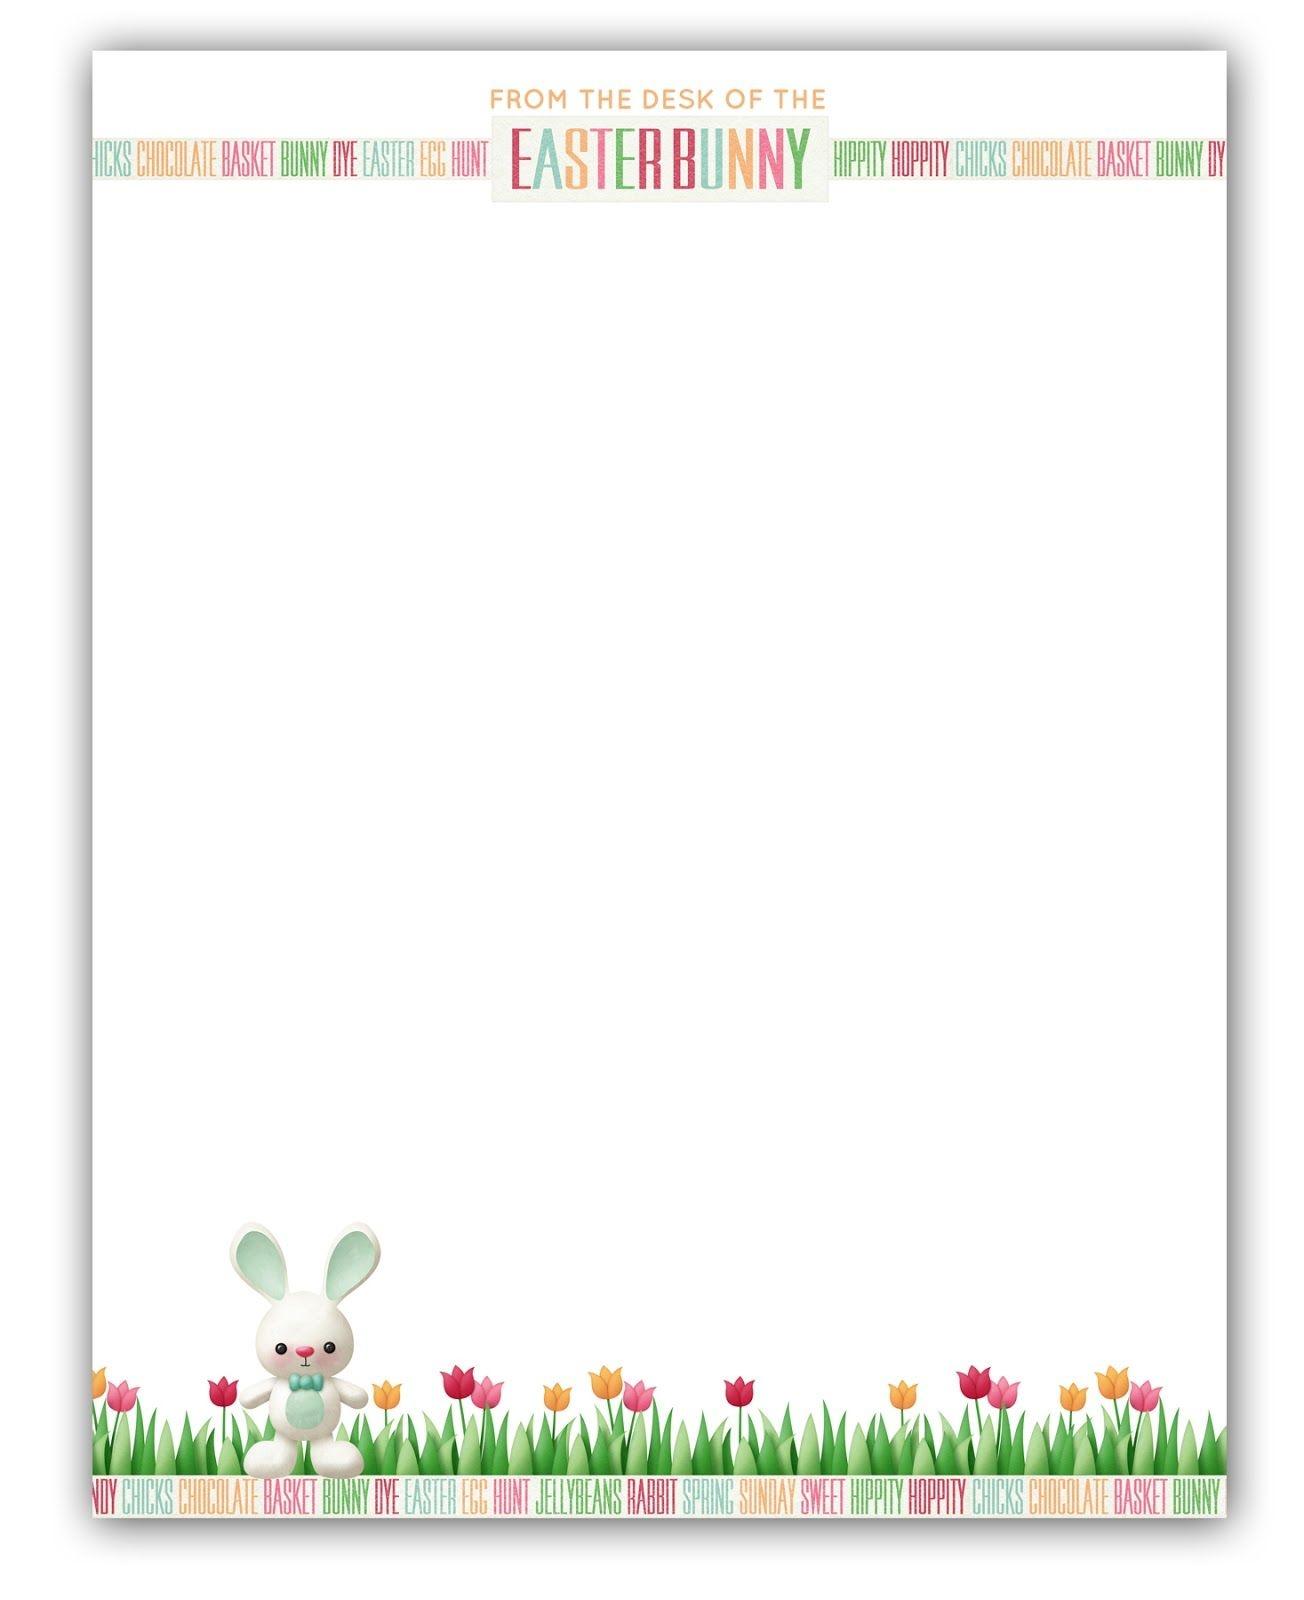 Easter Bunny Stationary | Free Printable | Printable Freebies! In - Free Printable Easter Stationery